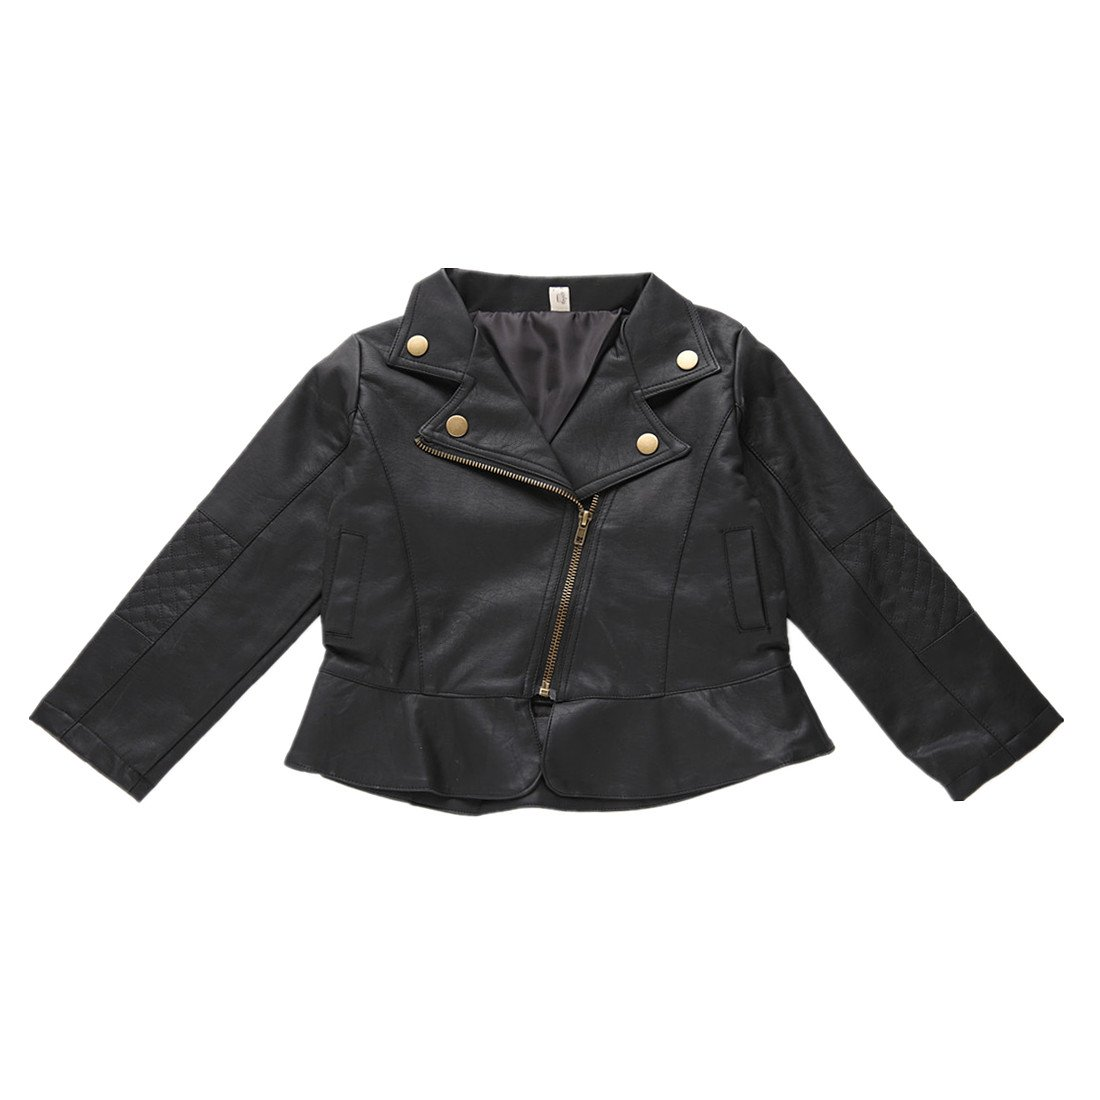 Winzik Baby Boys Girls Kids Outfits Spring Autumn PU Faux Leather Lapel Jacket Oblique Zipper Outerwear Coat (12-18 Months/5, Girls)